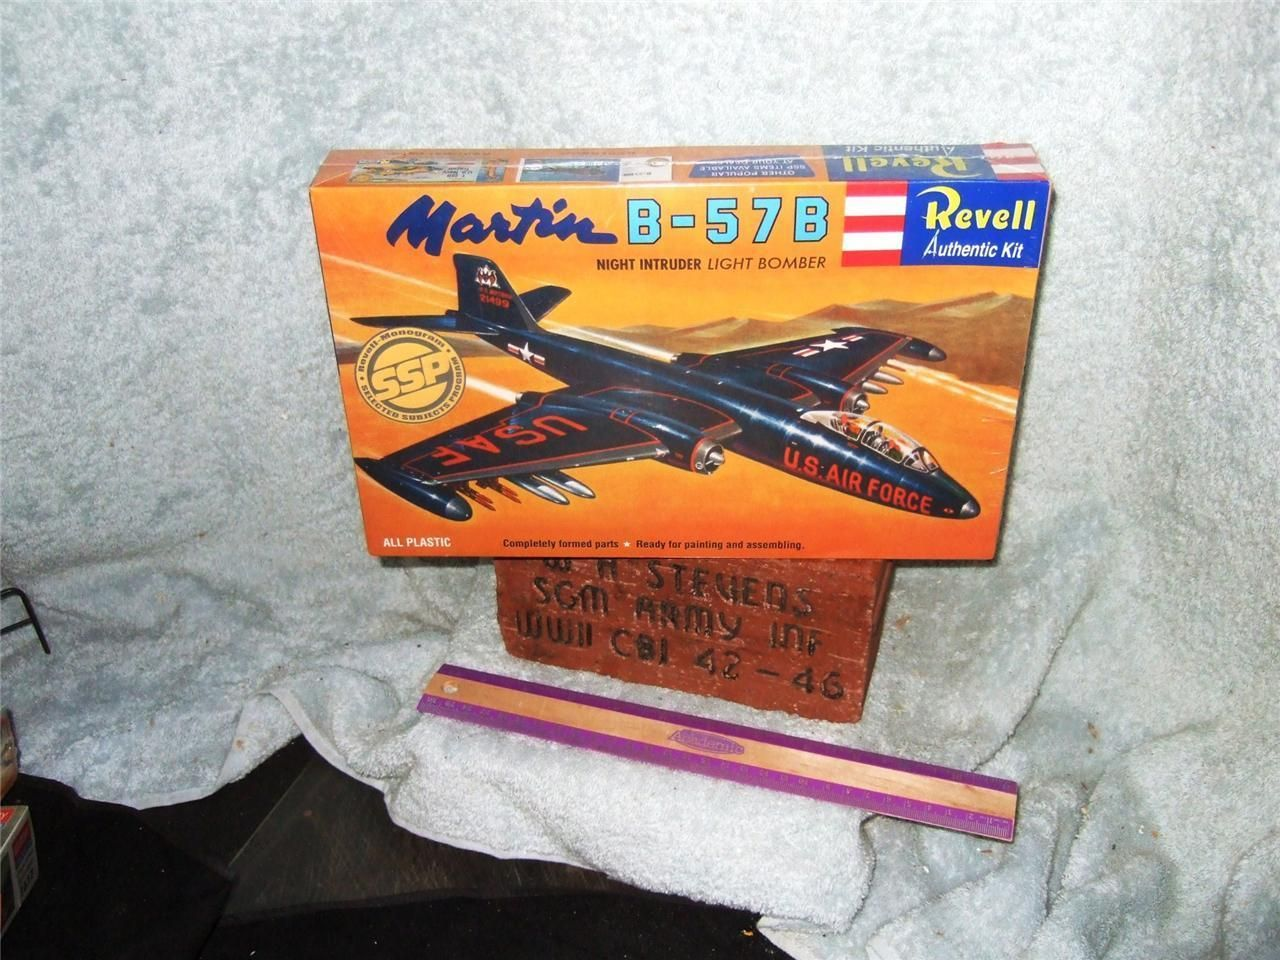 Revell 'SSP' 1/78 USAF MARTIN B-57B NIGHT INTRUDER BOMBER Model Kit picclick.com